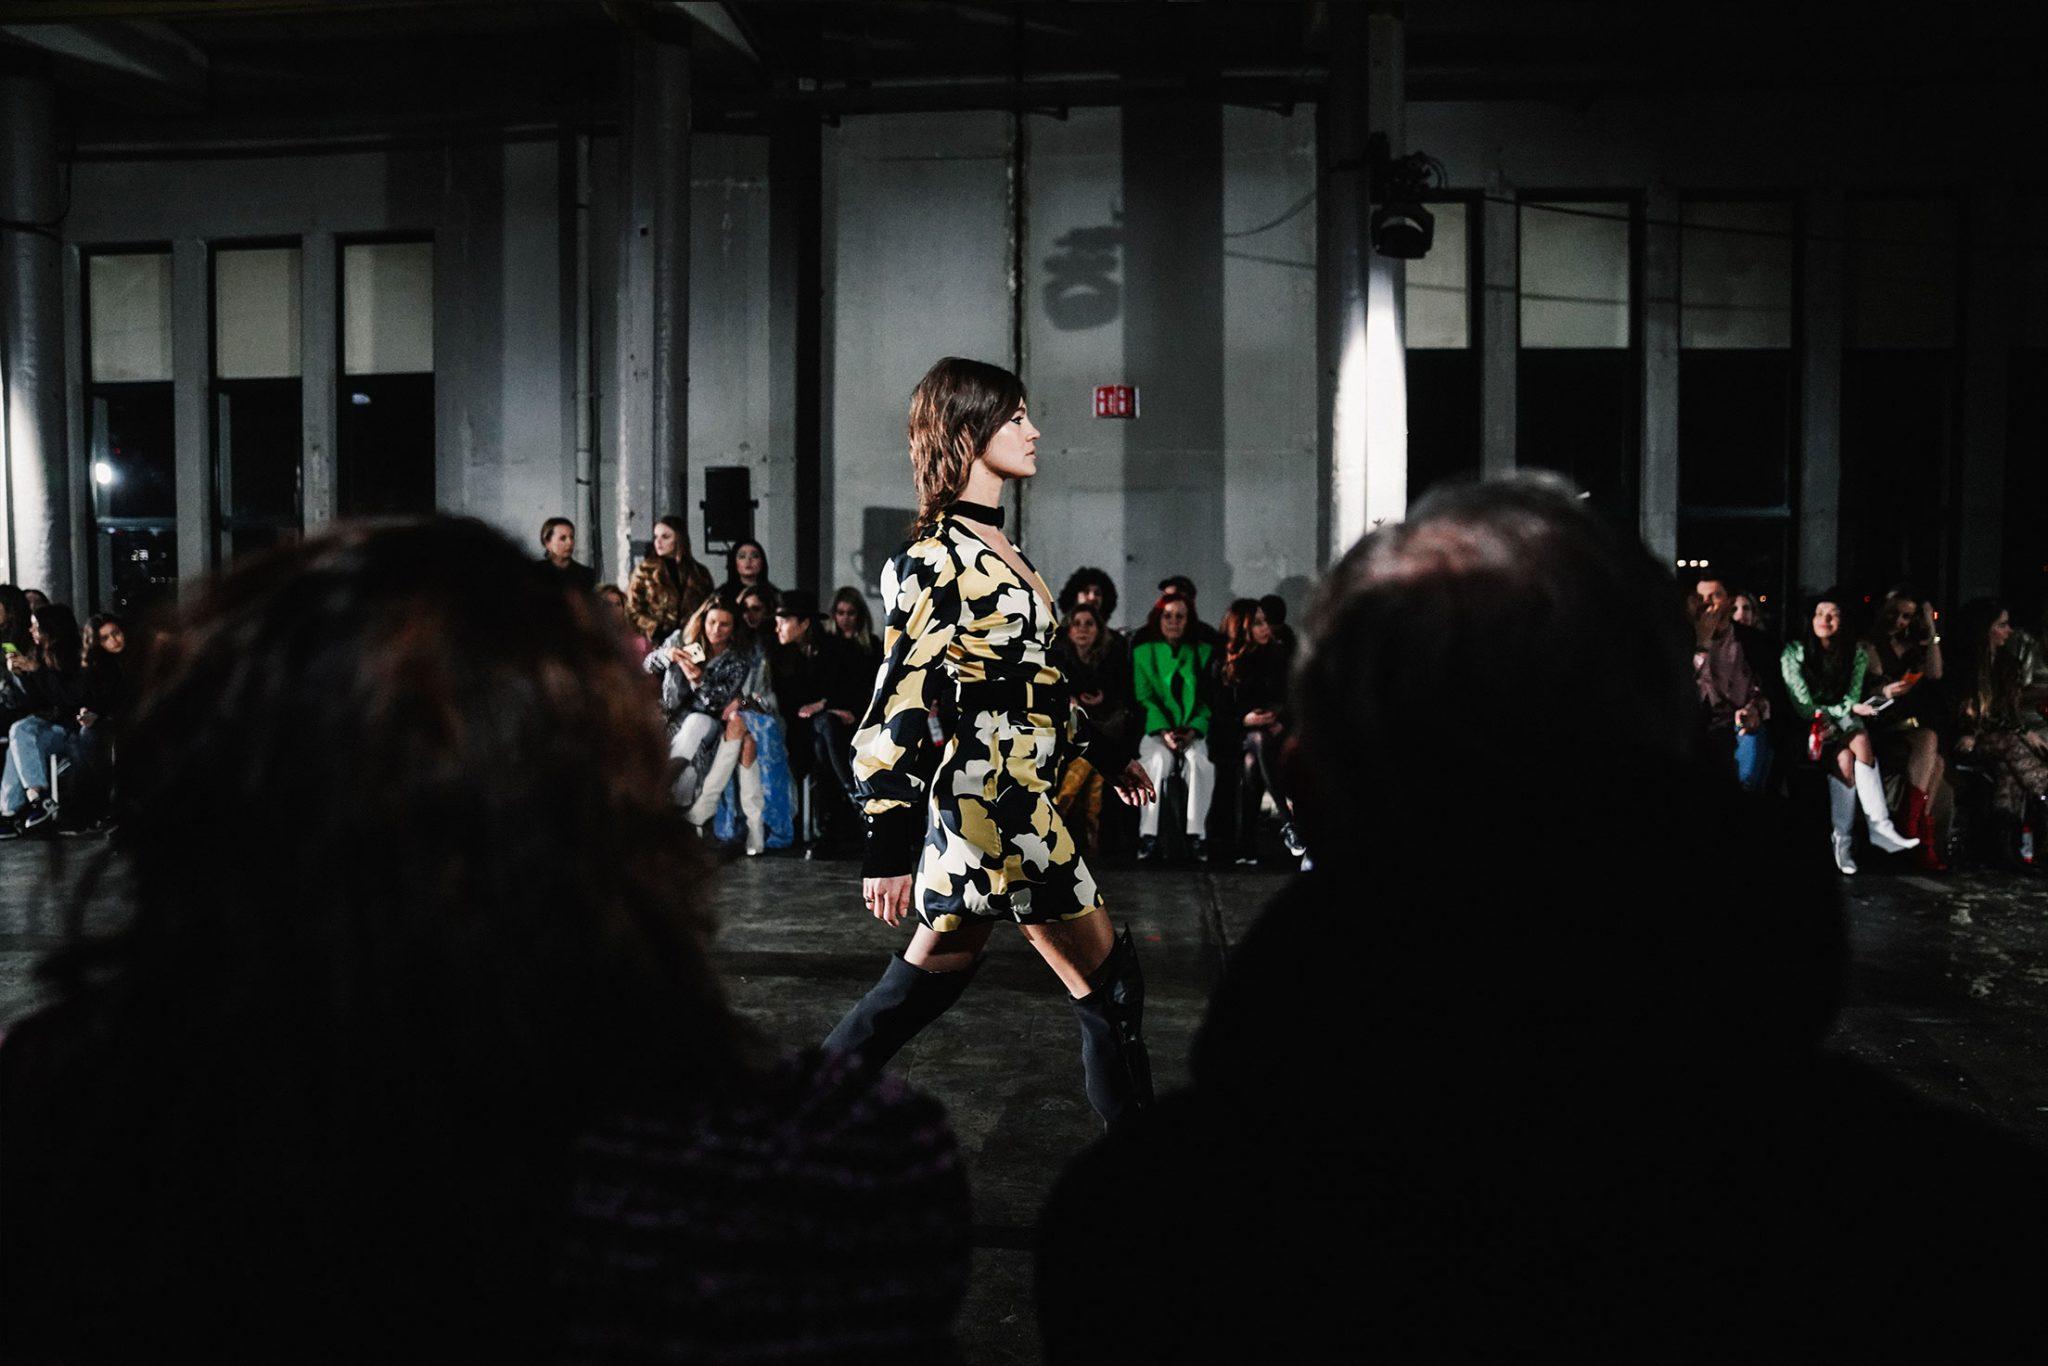 Ilsoo_van_Dijk_Ilsoovandijk_AFW_Toral_Backstage_Amsterdam_Fashion_week_2020_-scaled_19a